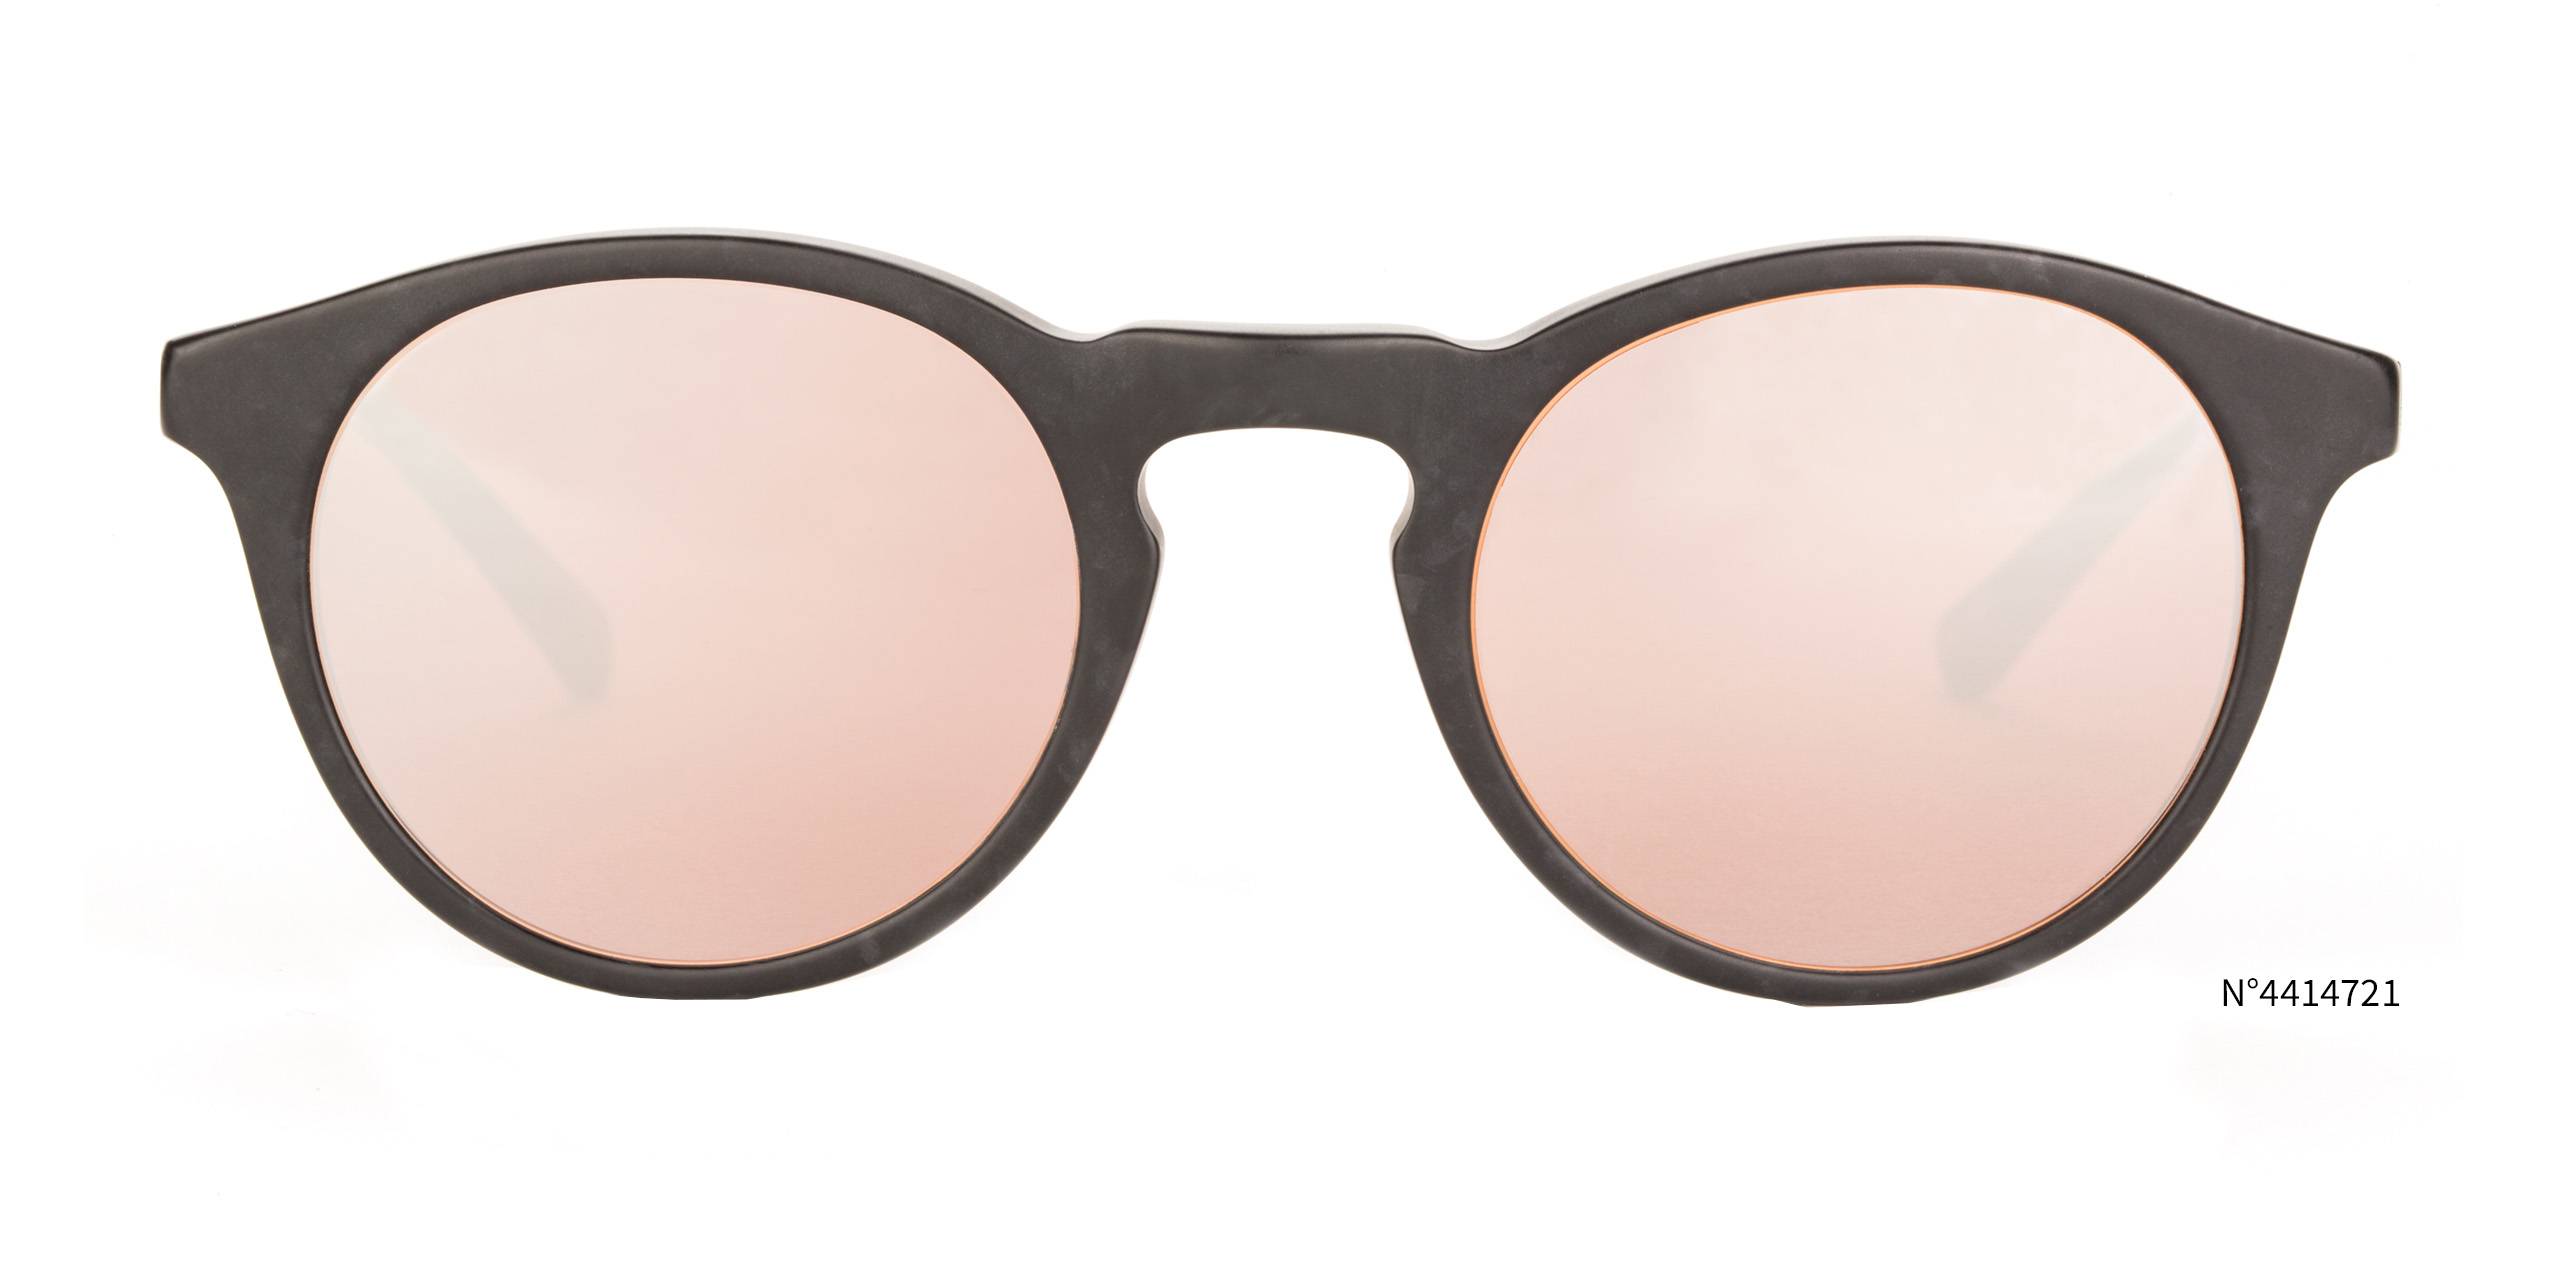 Retro/Funky Sunglasses for the Summer Festival Season ...